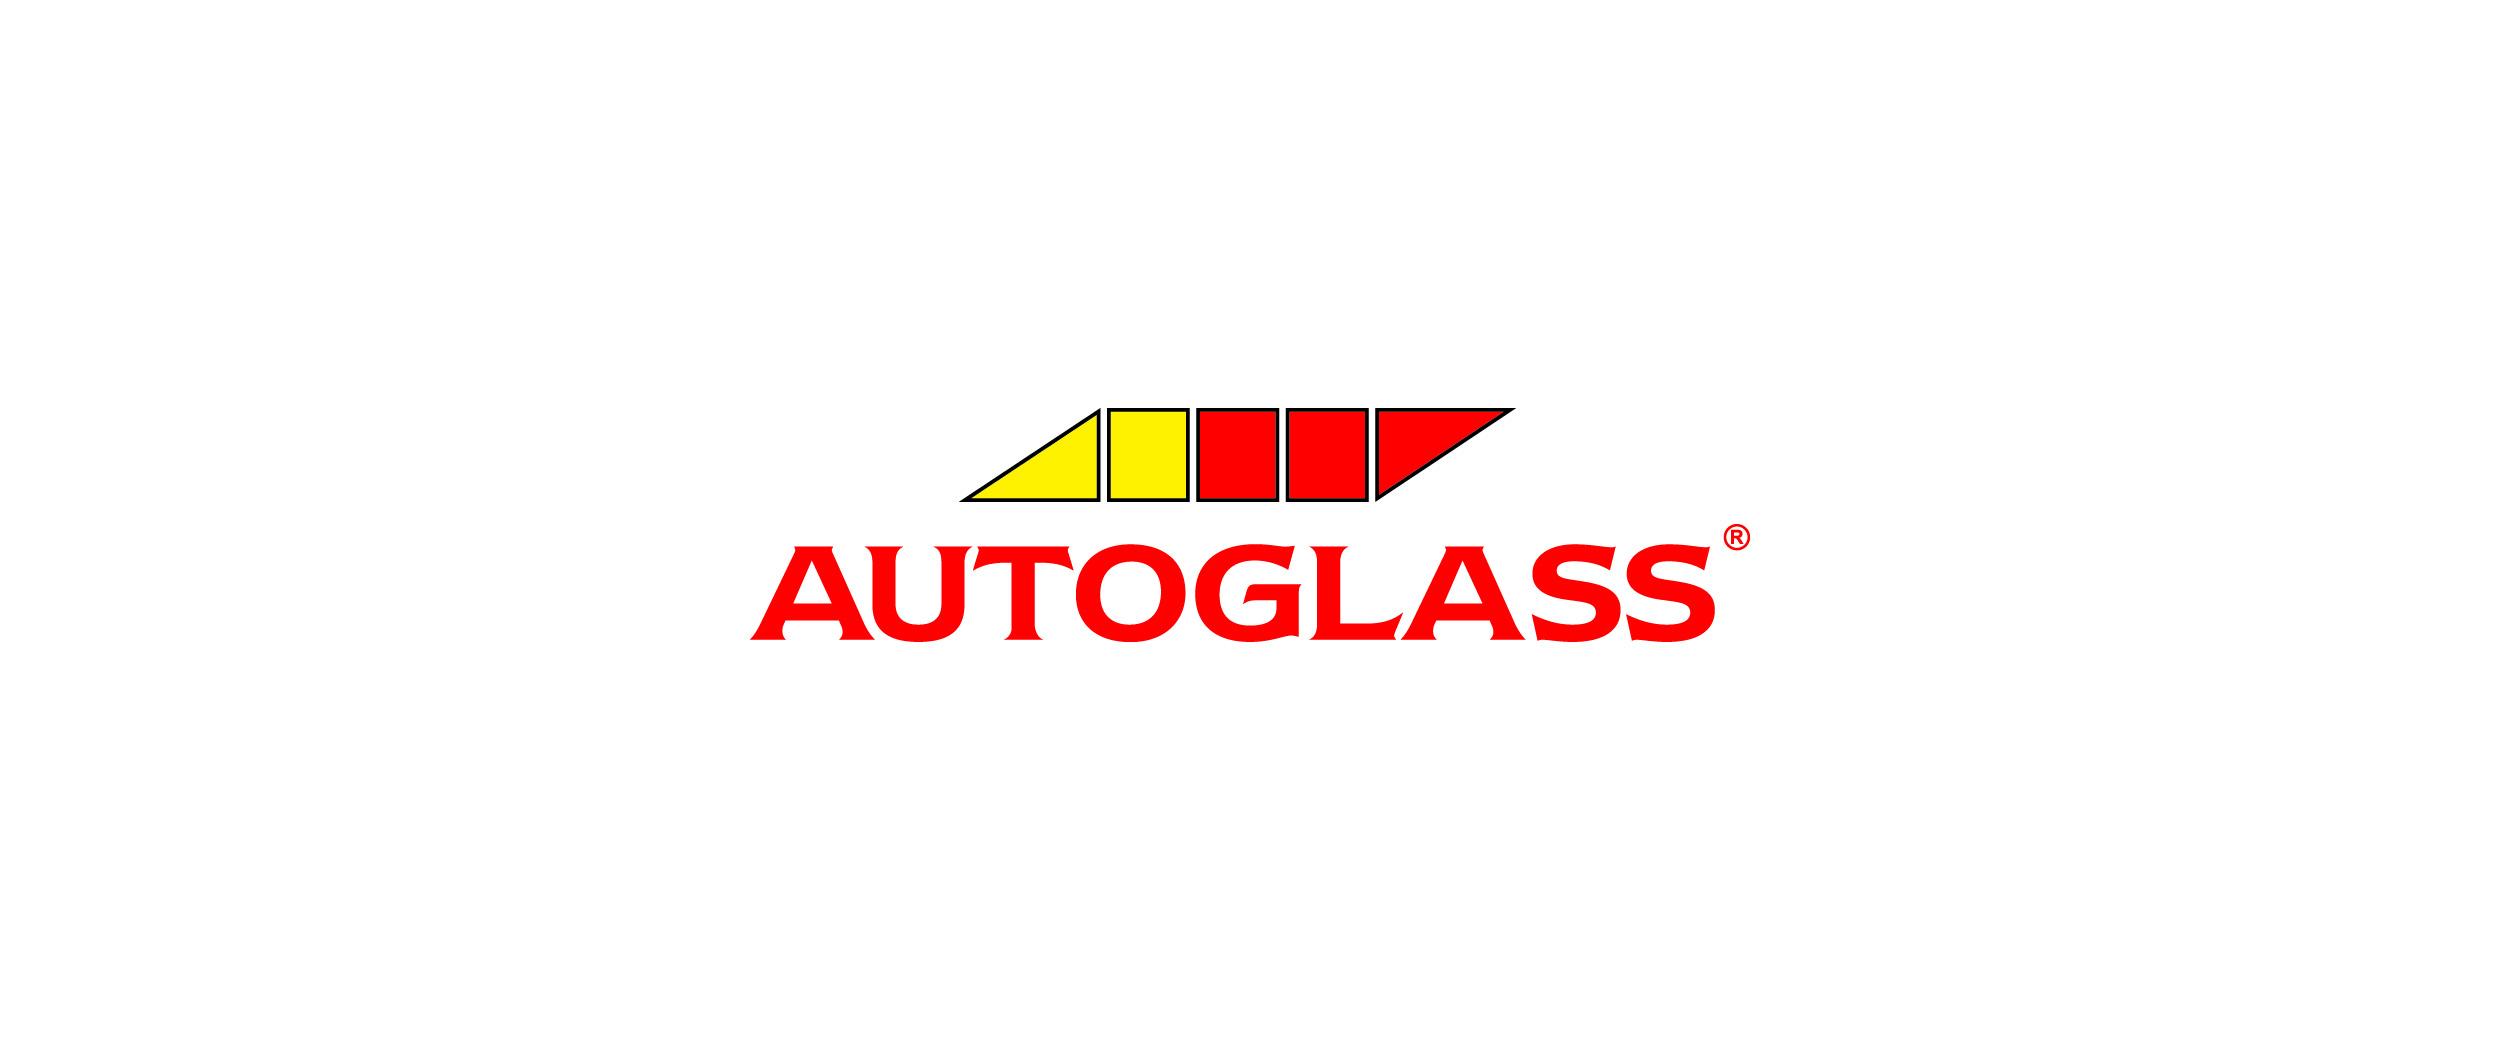 Autoglass.jpg